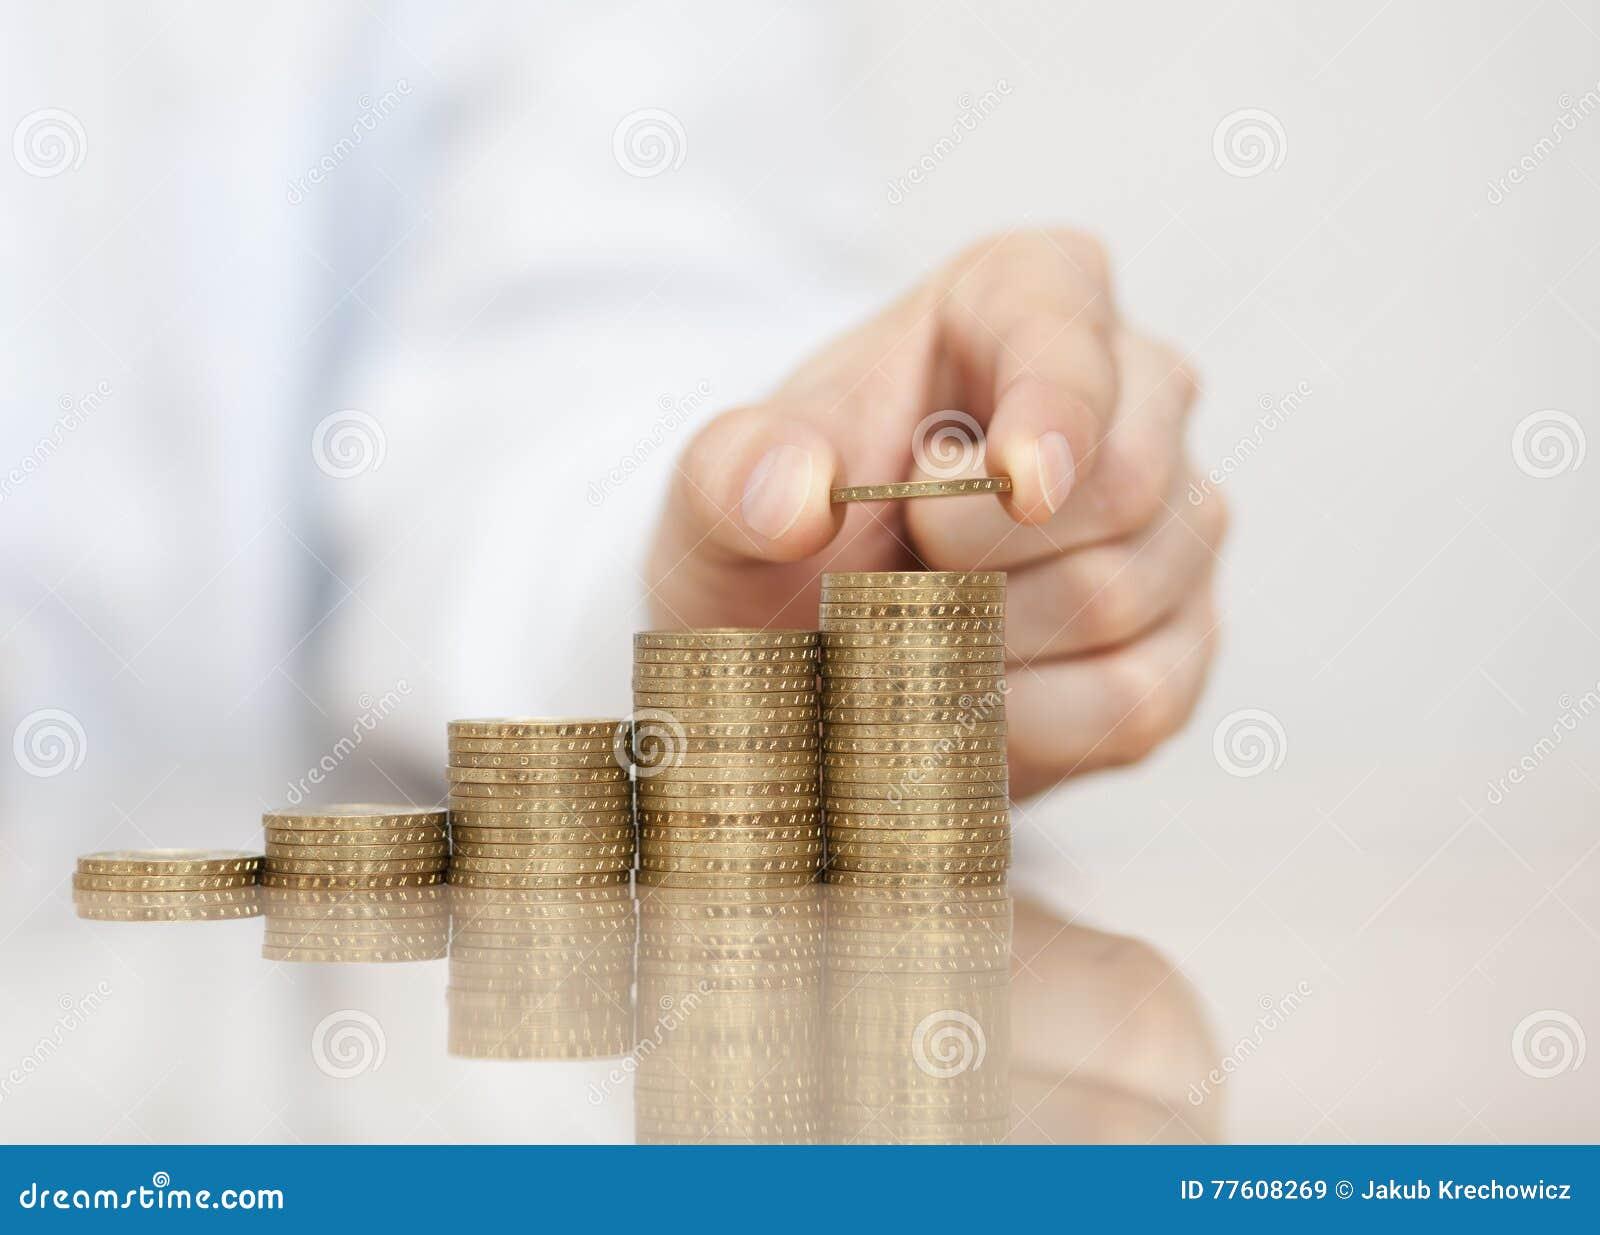 Поднимая стог монеток